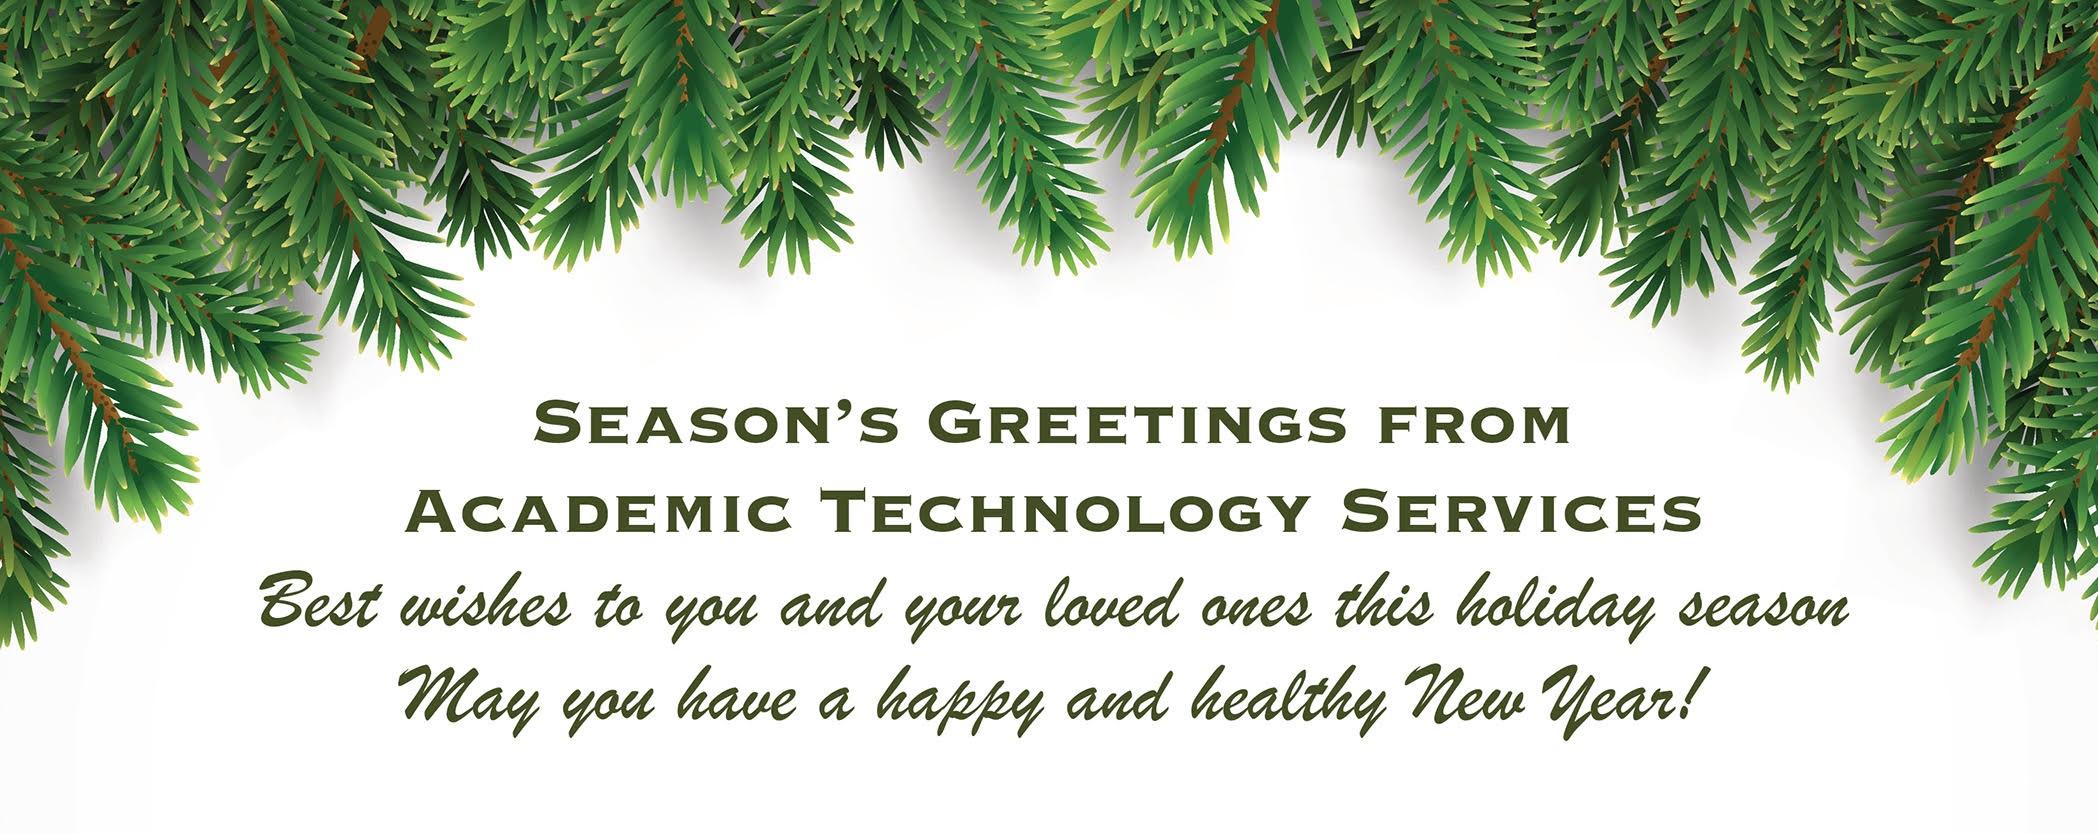 season's greetings message